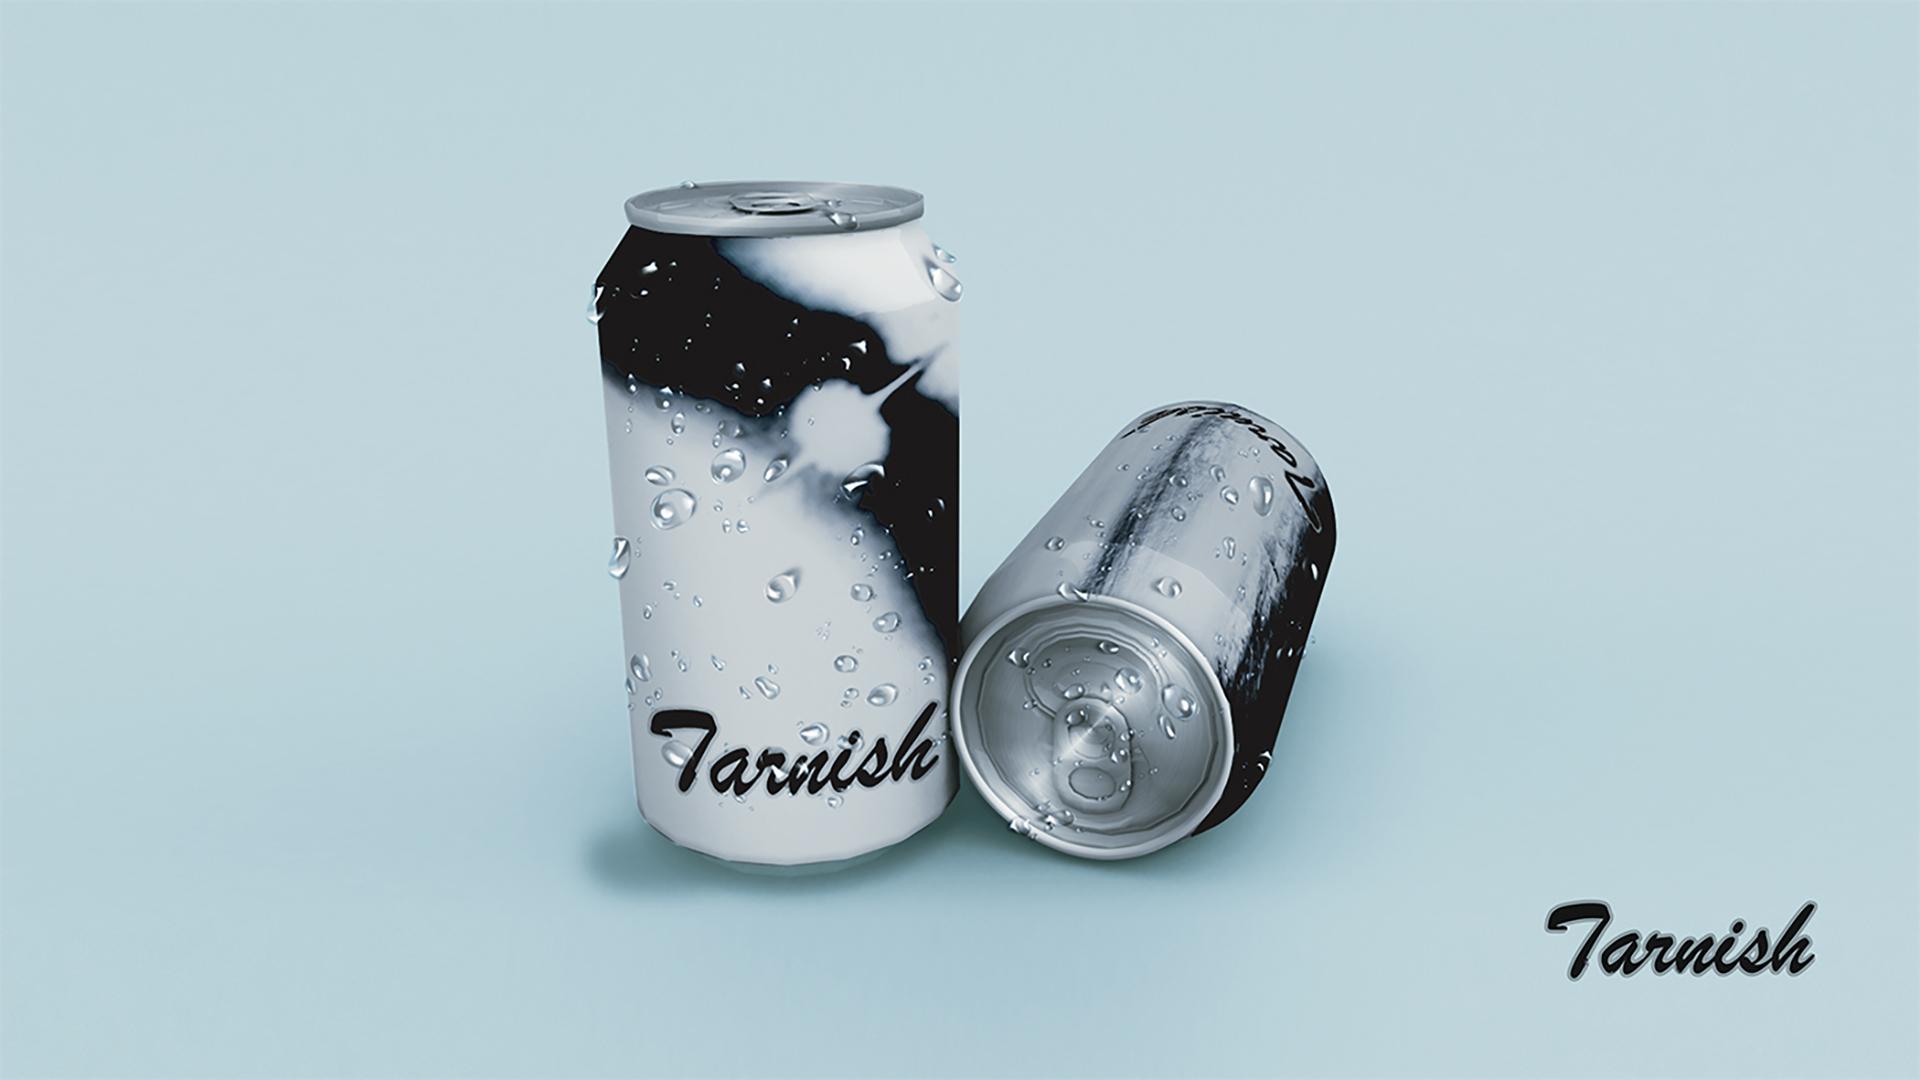 Tarnish冰啤 「星空」包装设计效果图